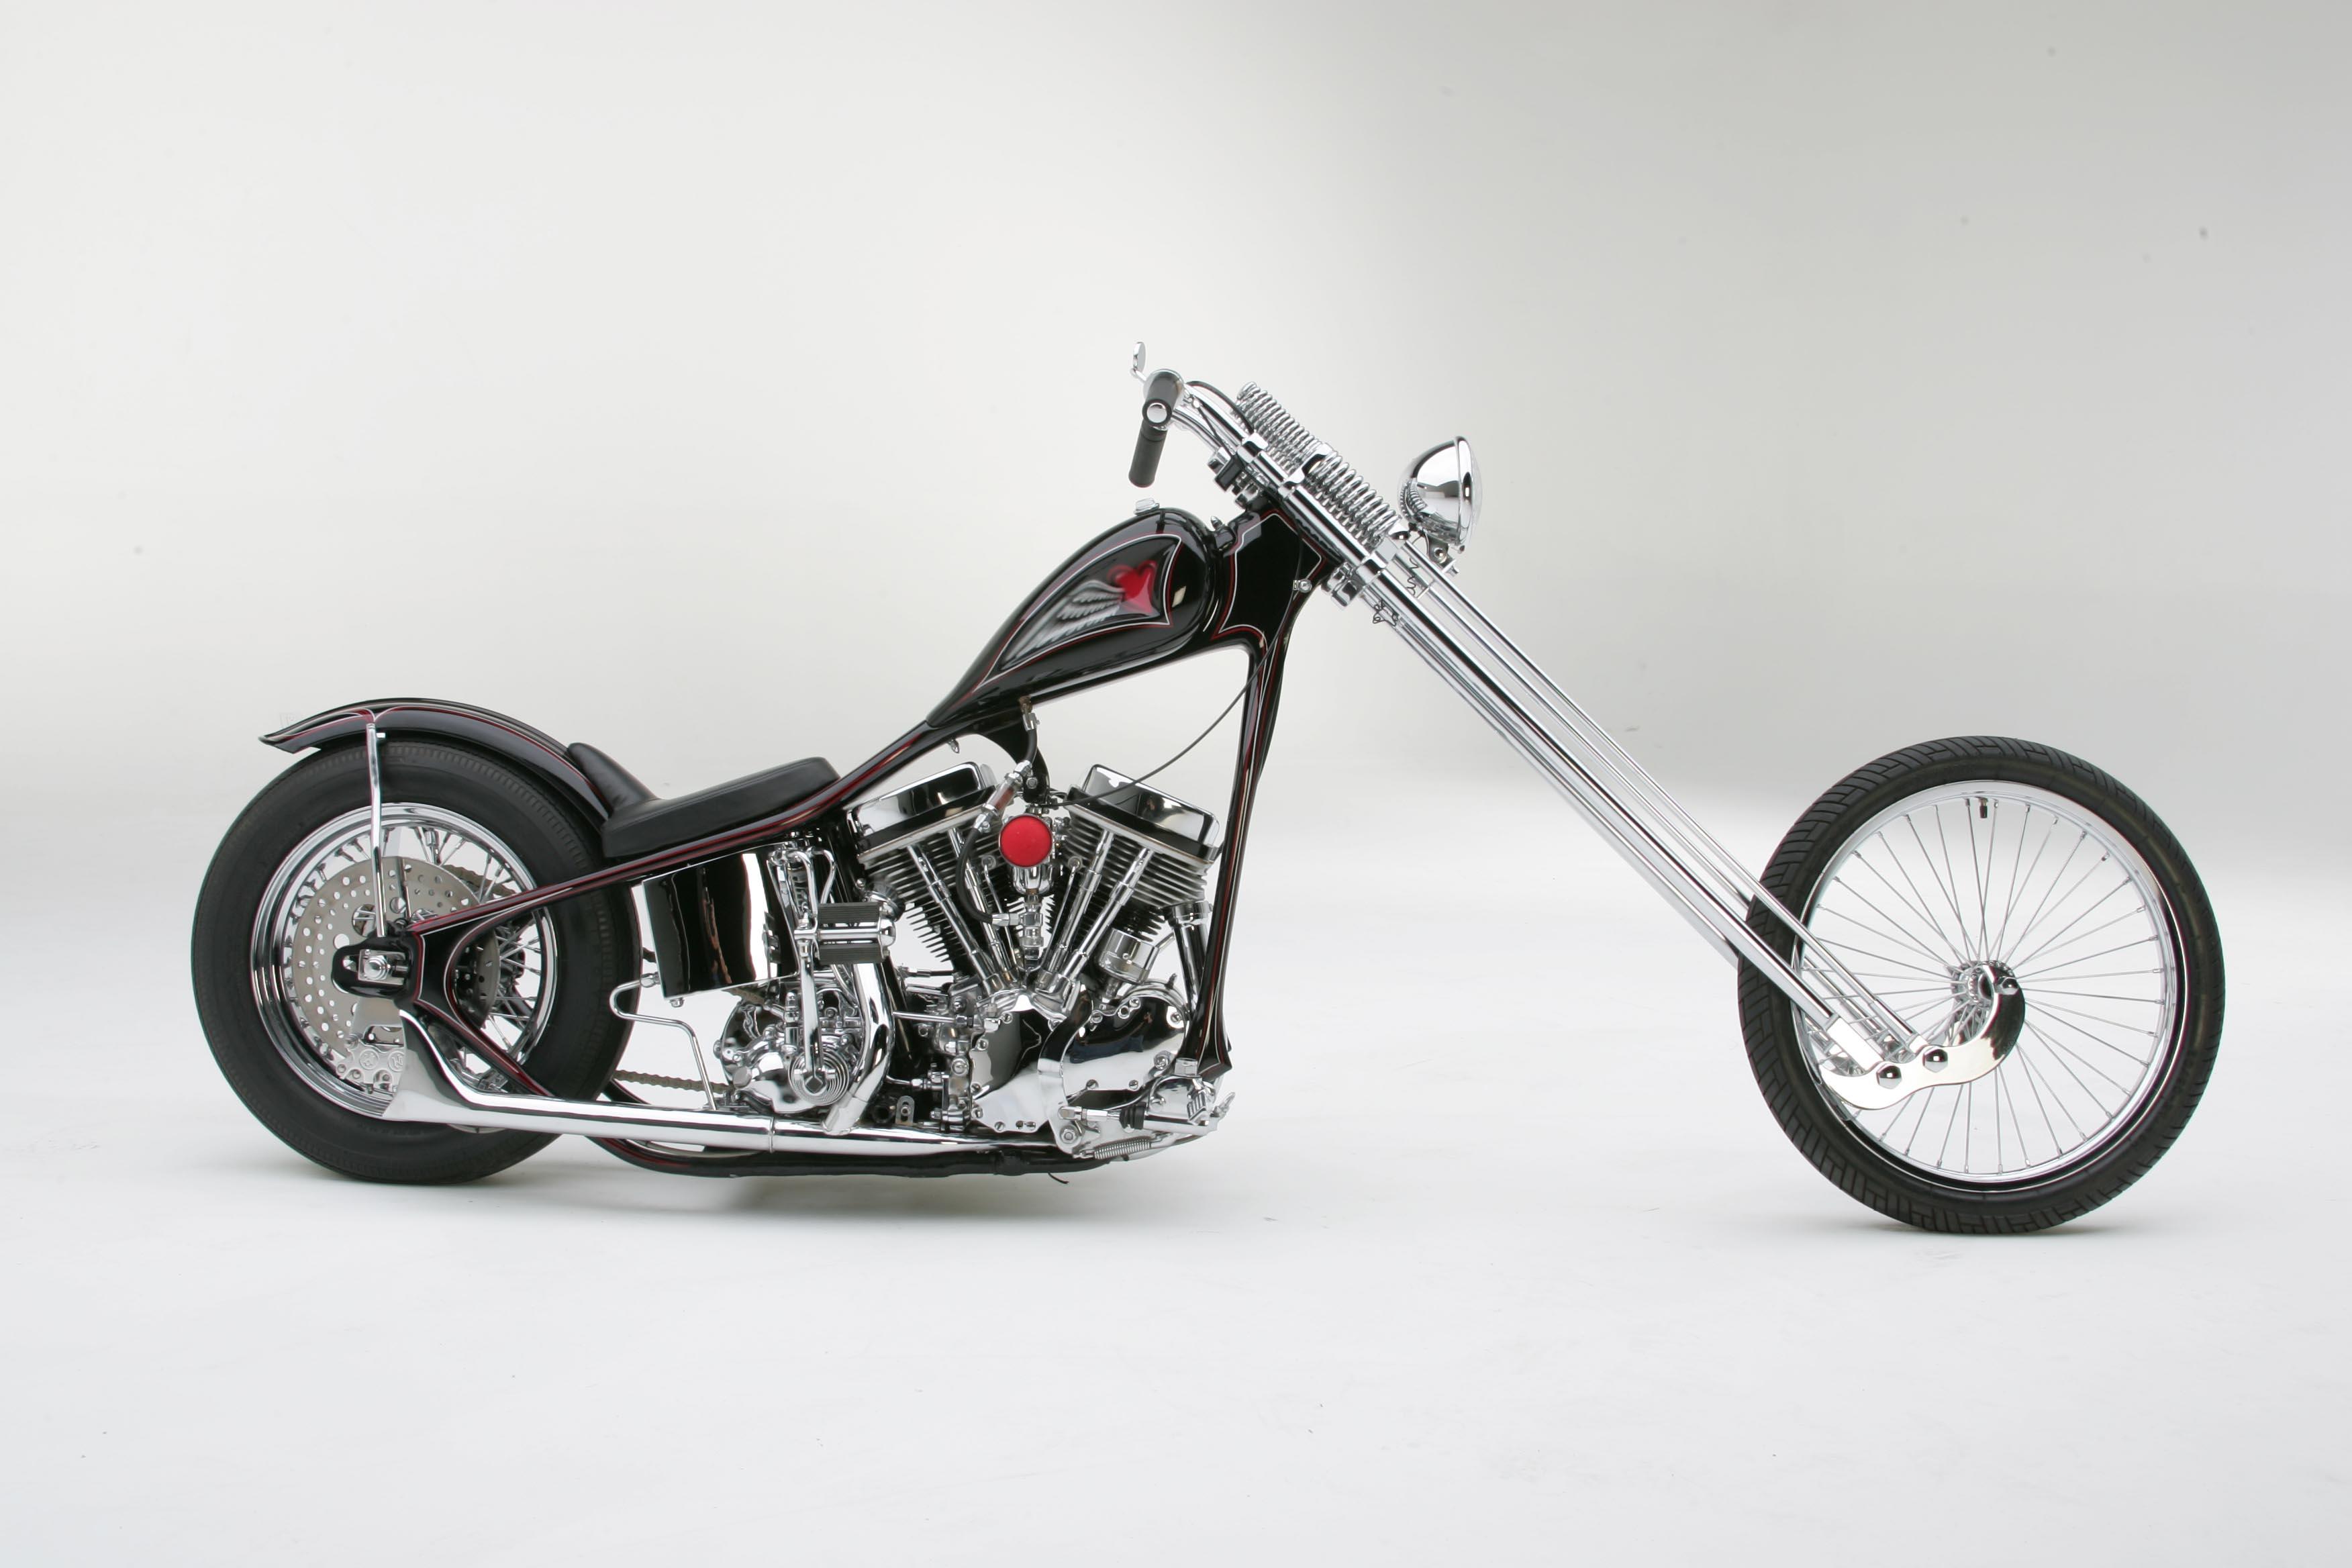 Harley Davidson Chopper Wallpaper   HD Wallpapers 3504x2336